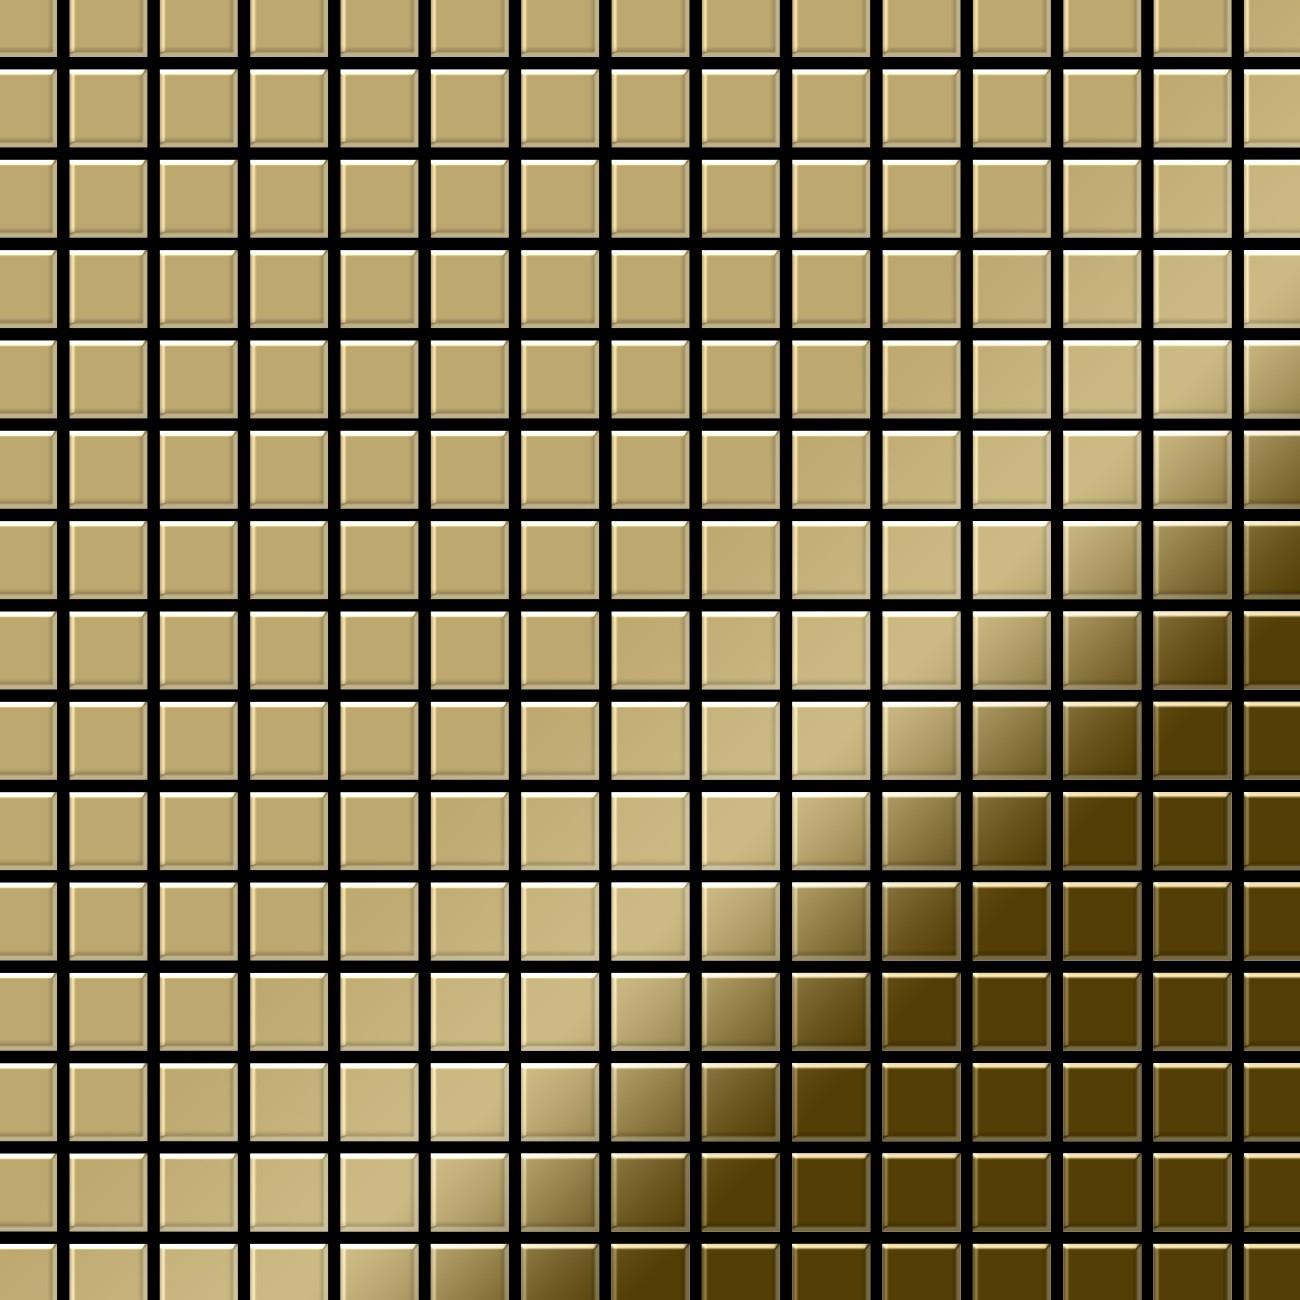 mosaik fliese massiv metall titan hochgl nzend gold 1 6mm. Black Bedroom Furniture Sets. Home Design Ideas